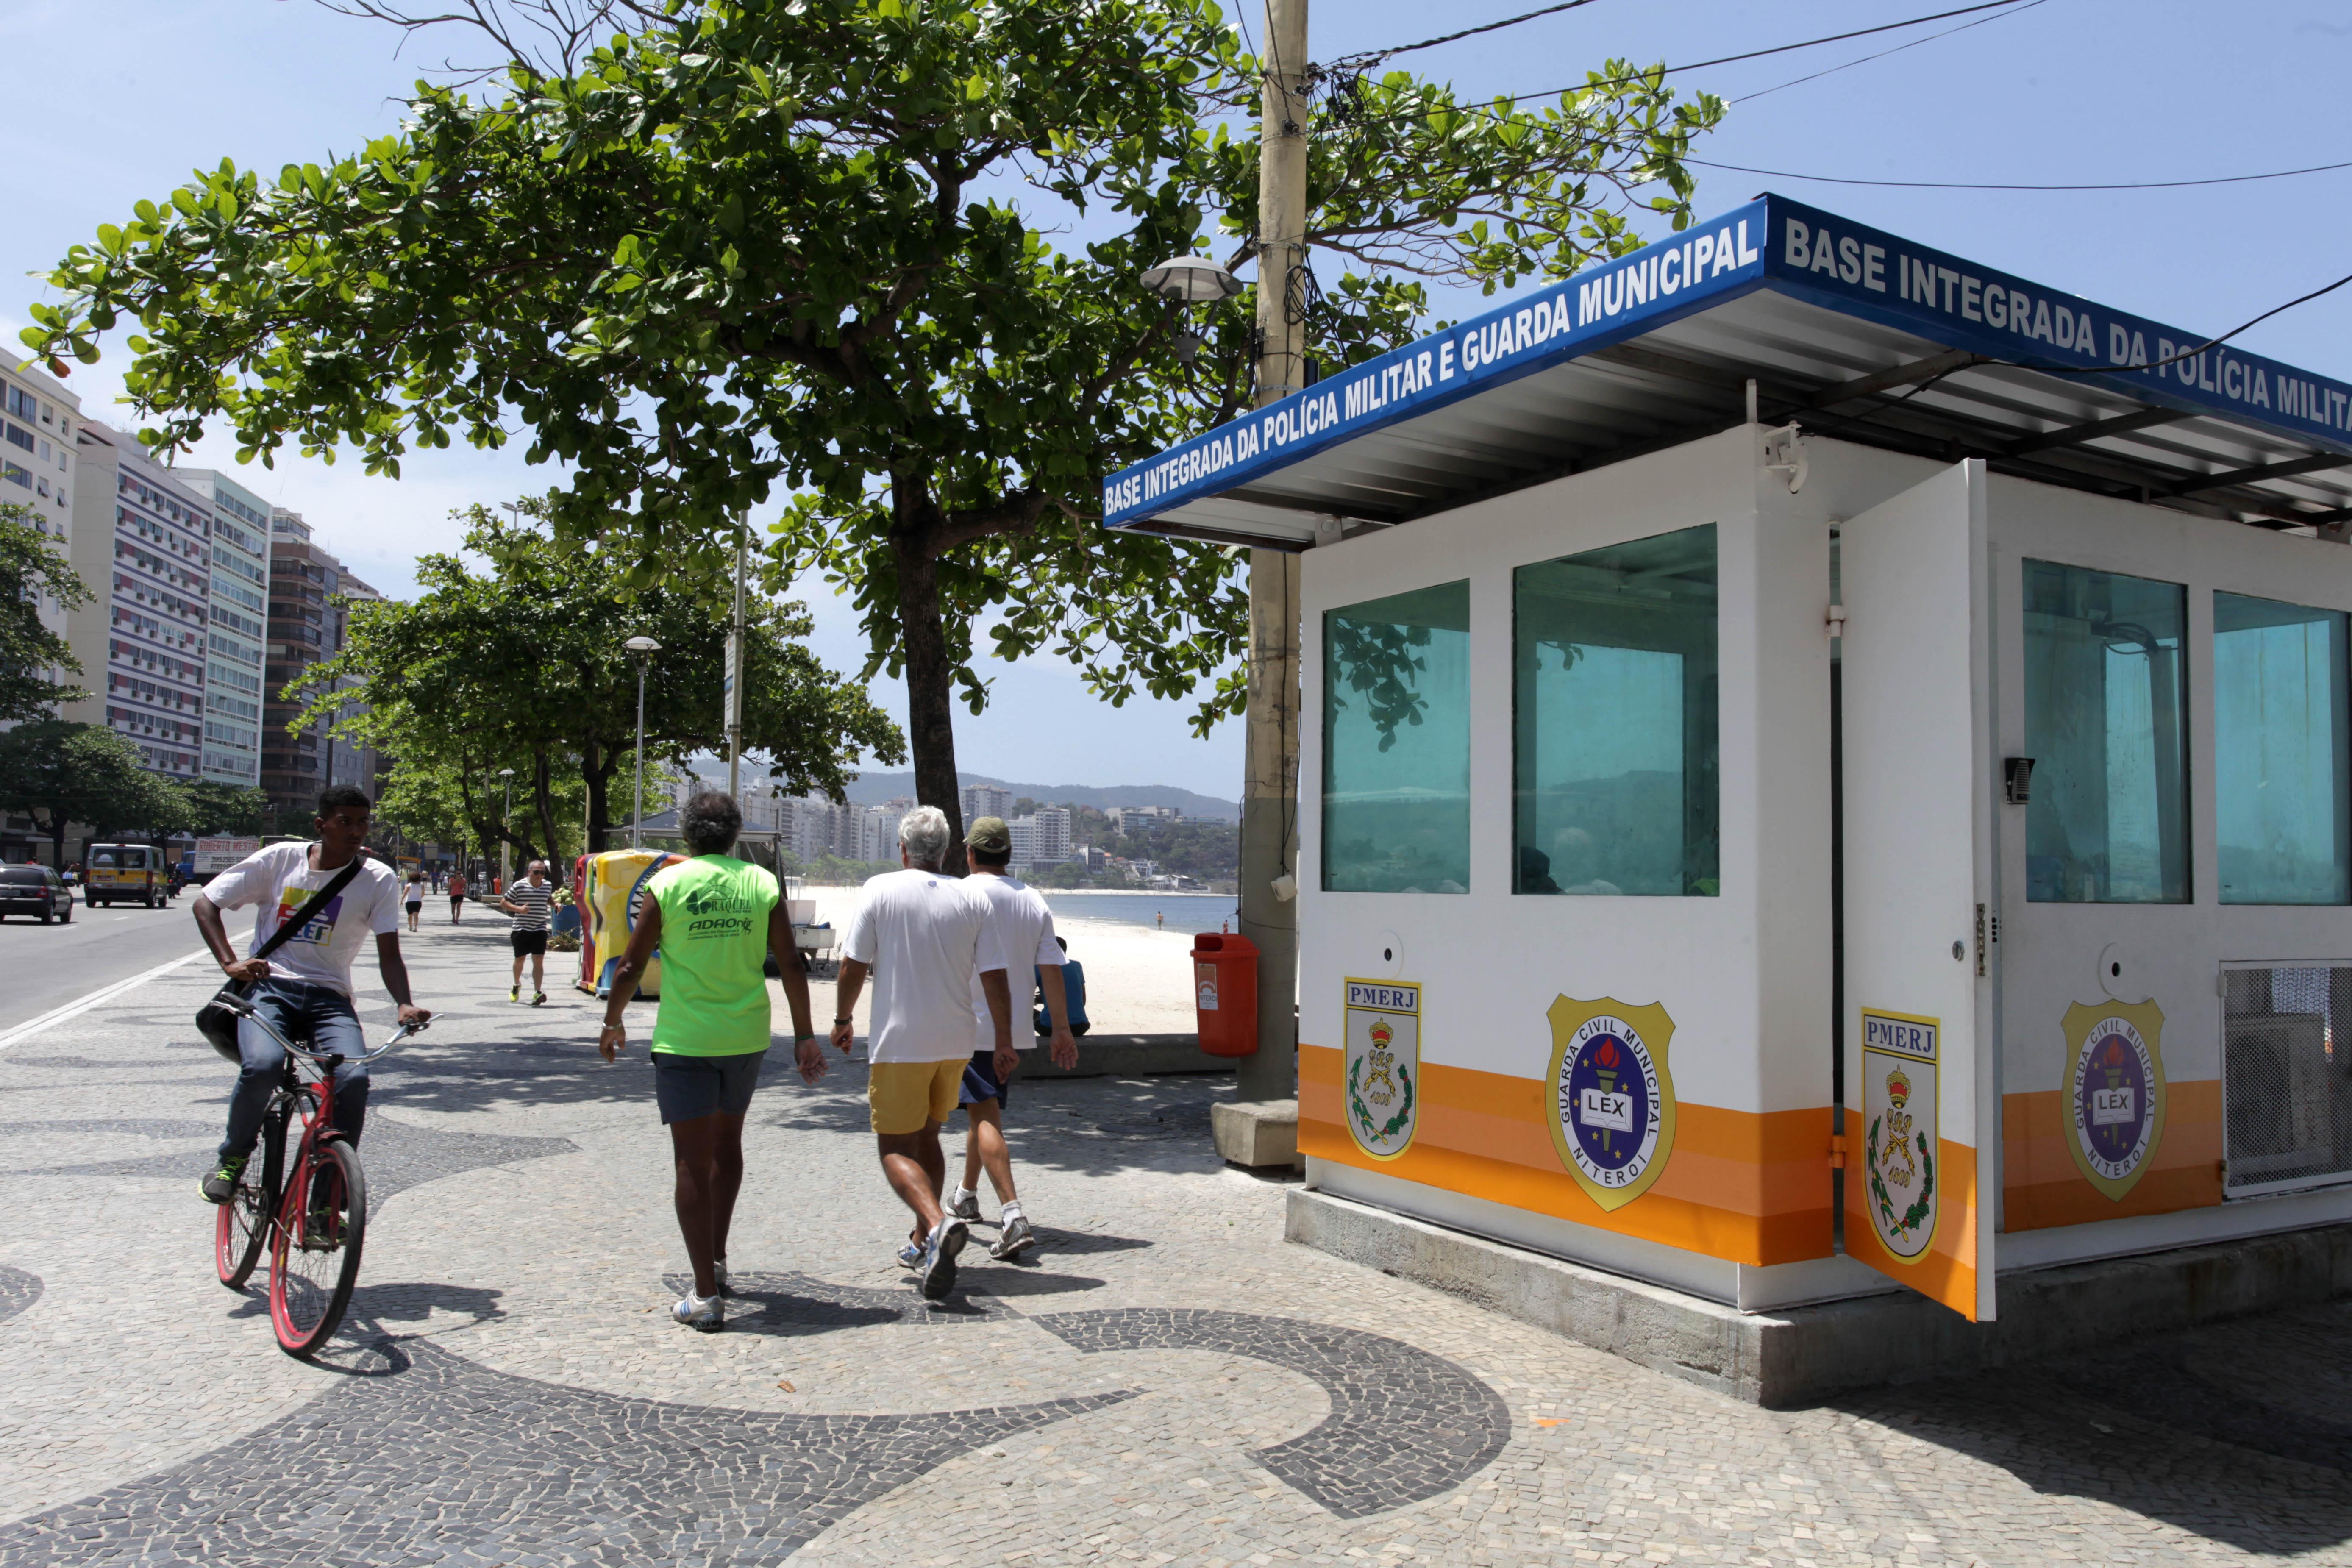 Cabine de Base iIntegrada da Guarda Municipal e PM em Icaraí, Niterói.